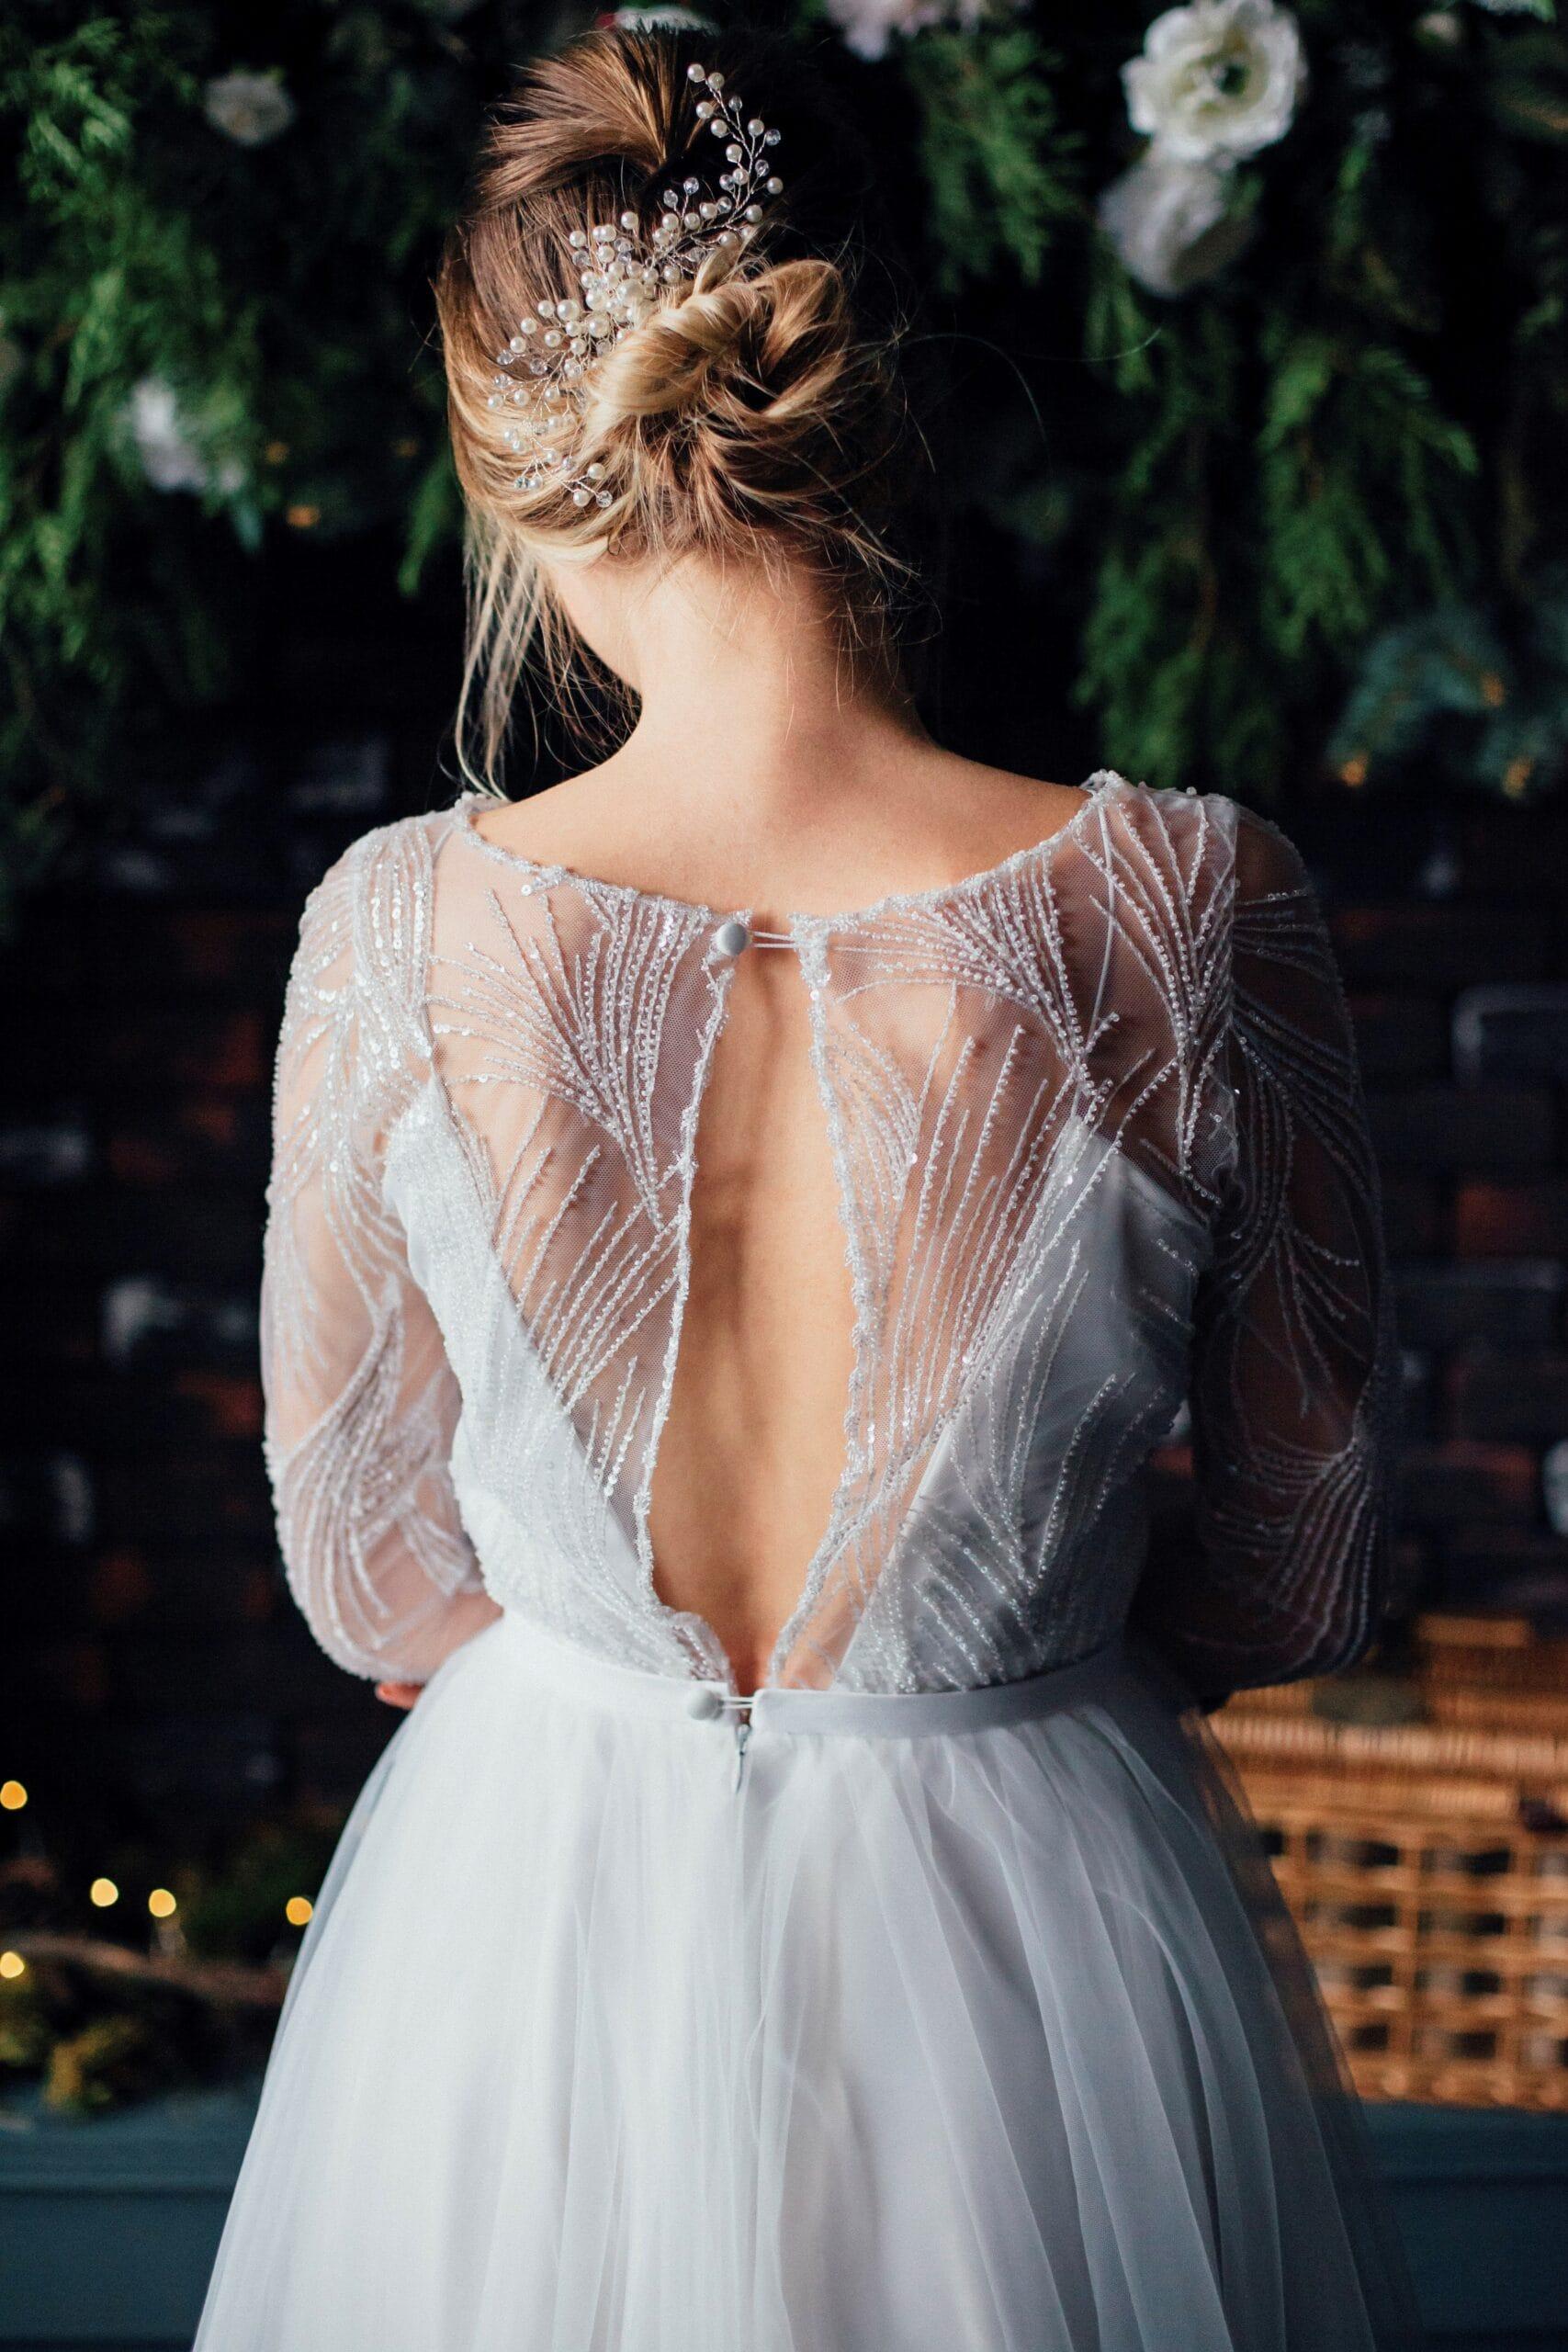 Свадебное платье EVELYN, коллекция THE ABSOLUTE LOVE, бренд RARE BRIDAL, фото 2